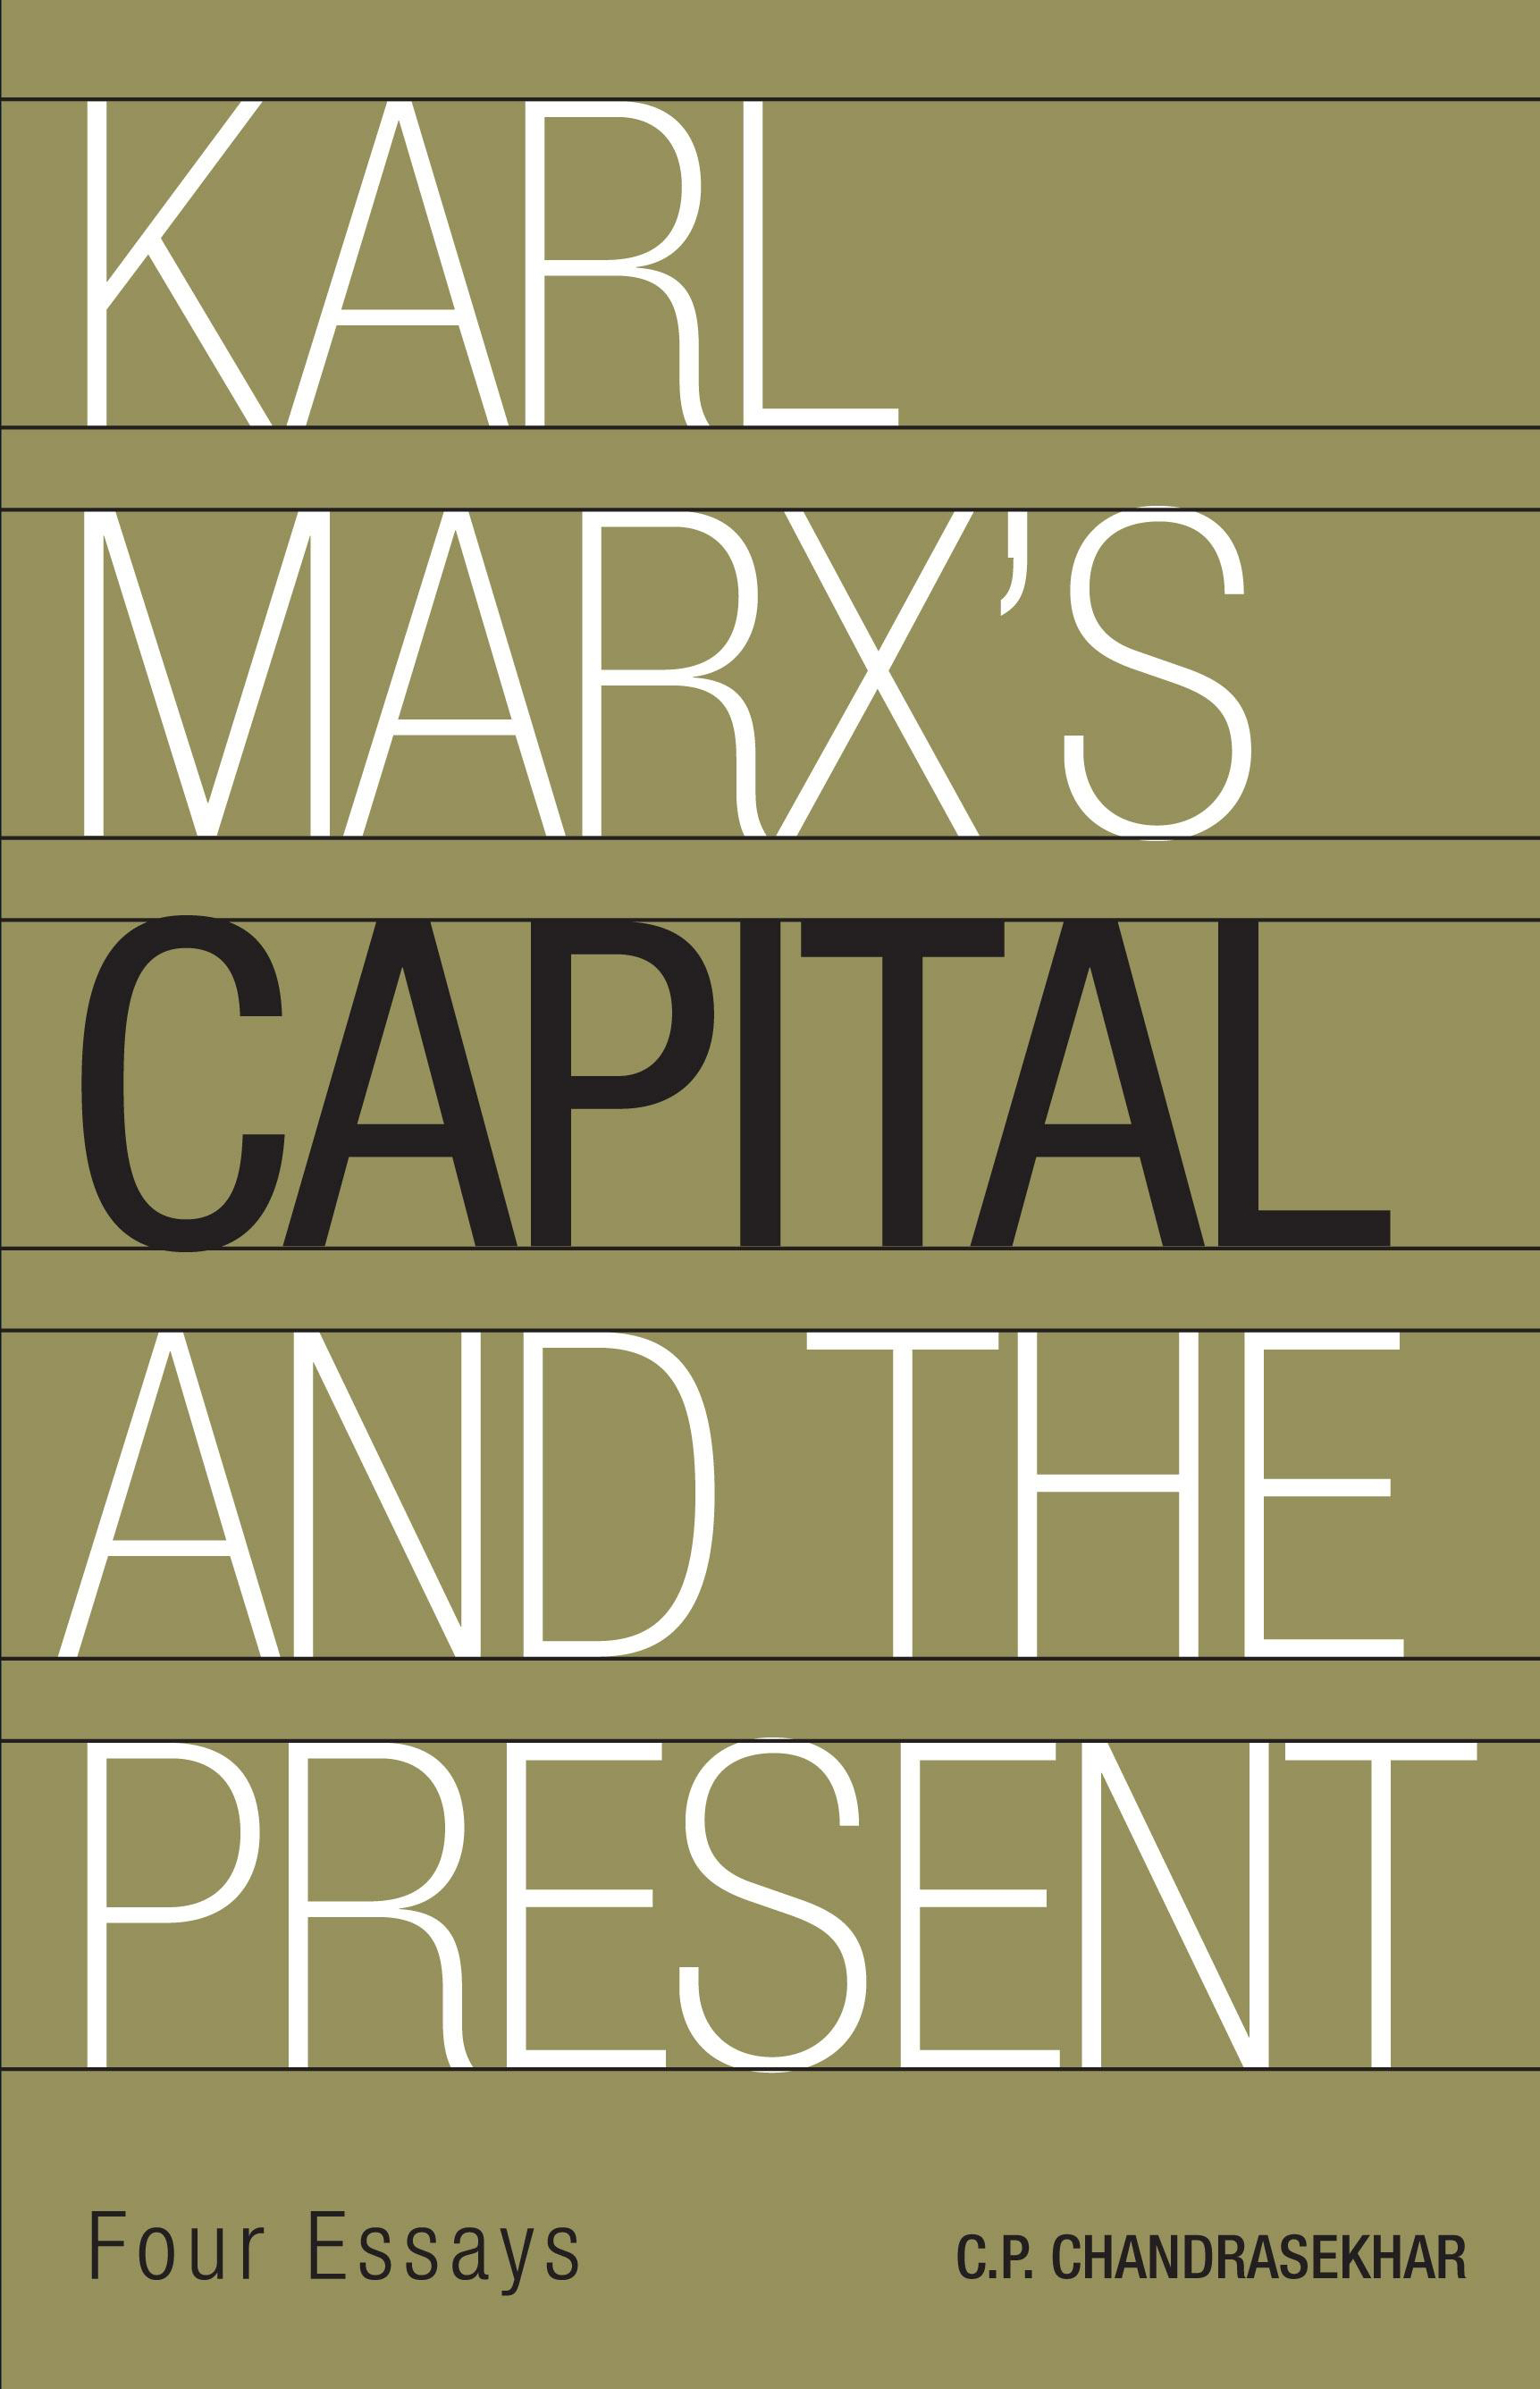 C. P. Chandrasekhar: Karl Marx's Capital and the Presenr